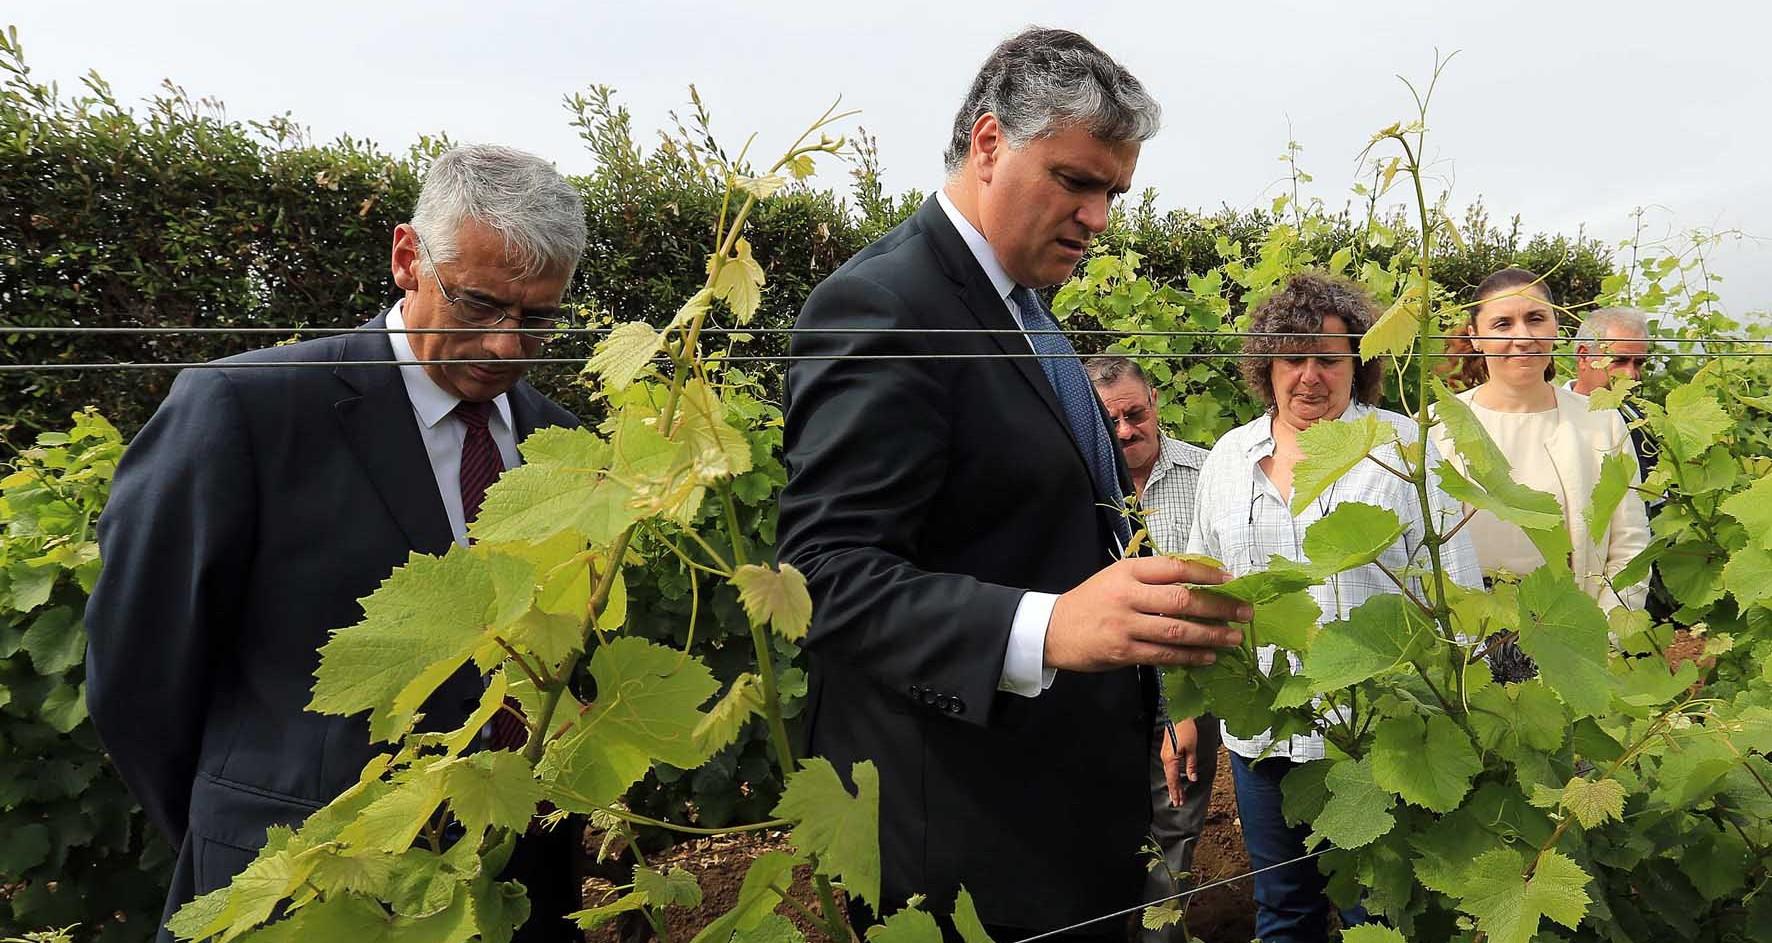 Estratégia para potenciar setor vitivinícola permite recuperar mais de 326 hectares, anuncia Vasco Cordeiro